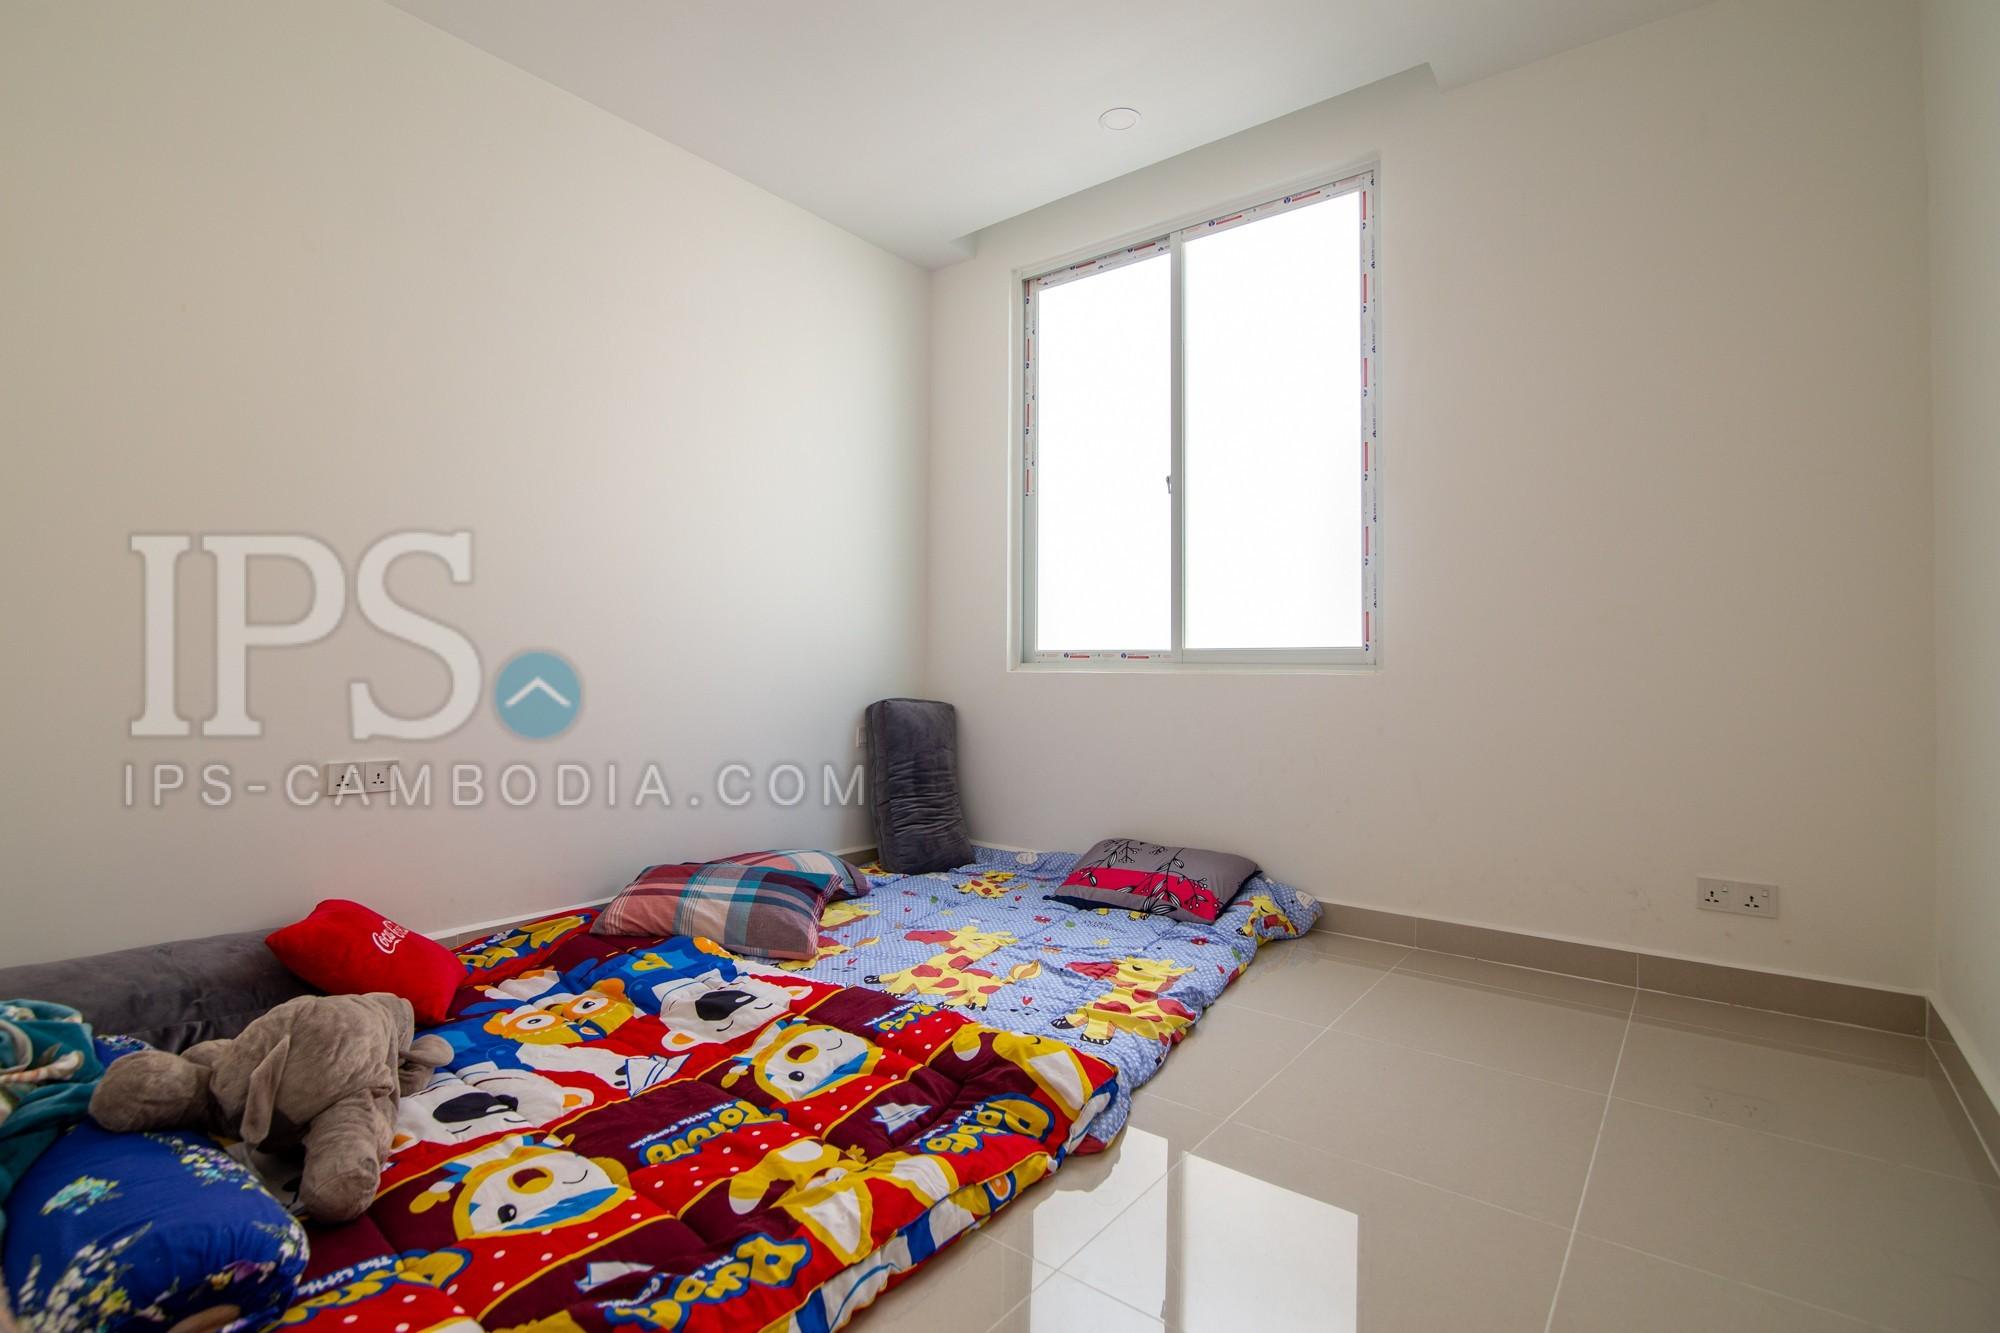 3 Bedroom Twin Villa For Sale - Chroy Changvar, Phnom Penh